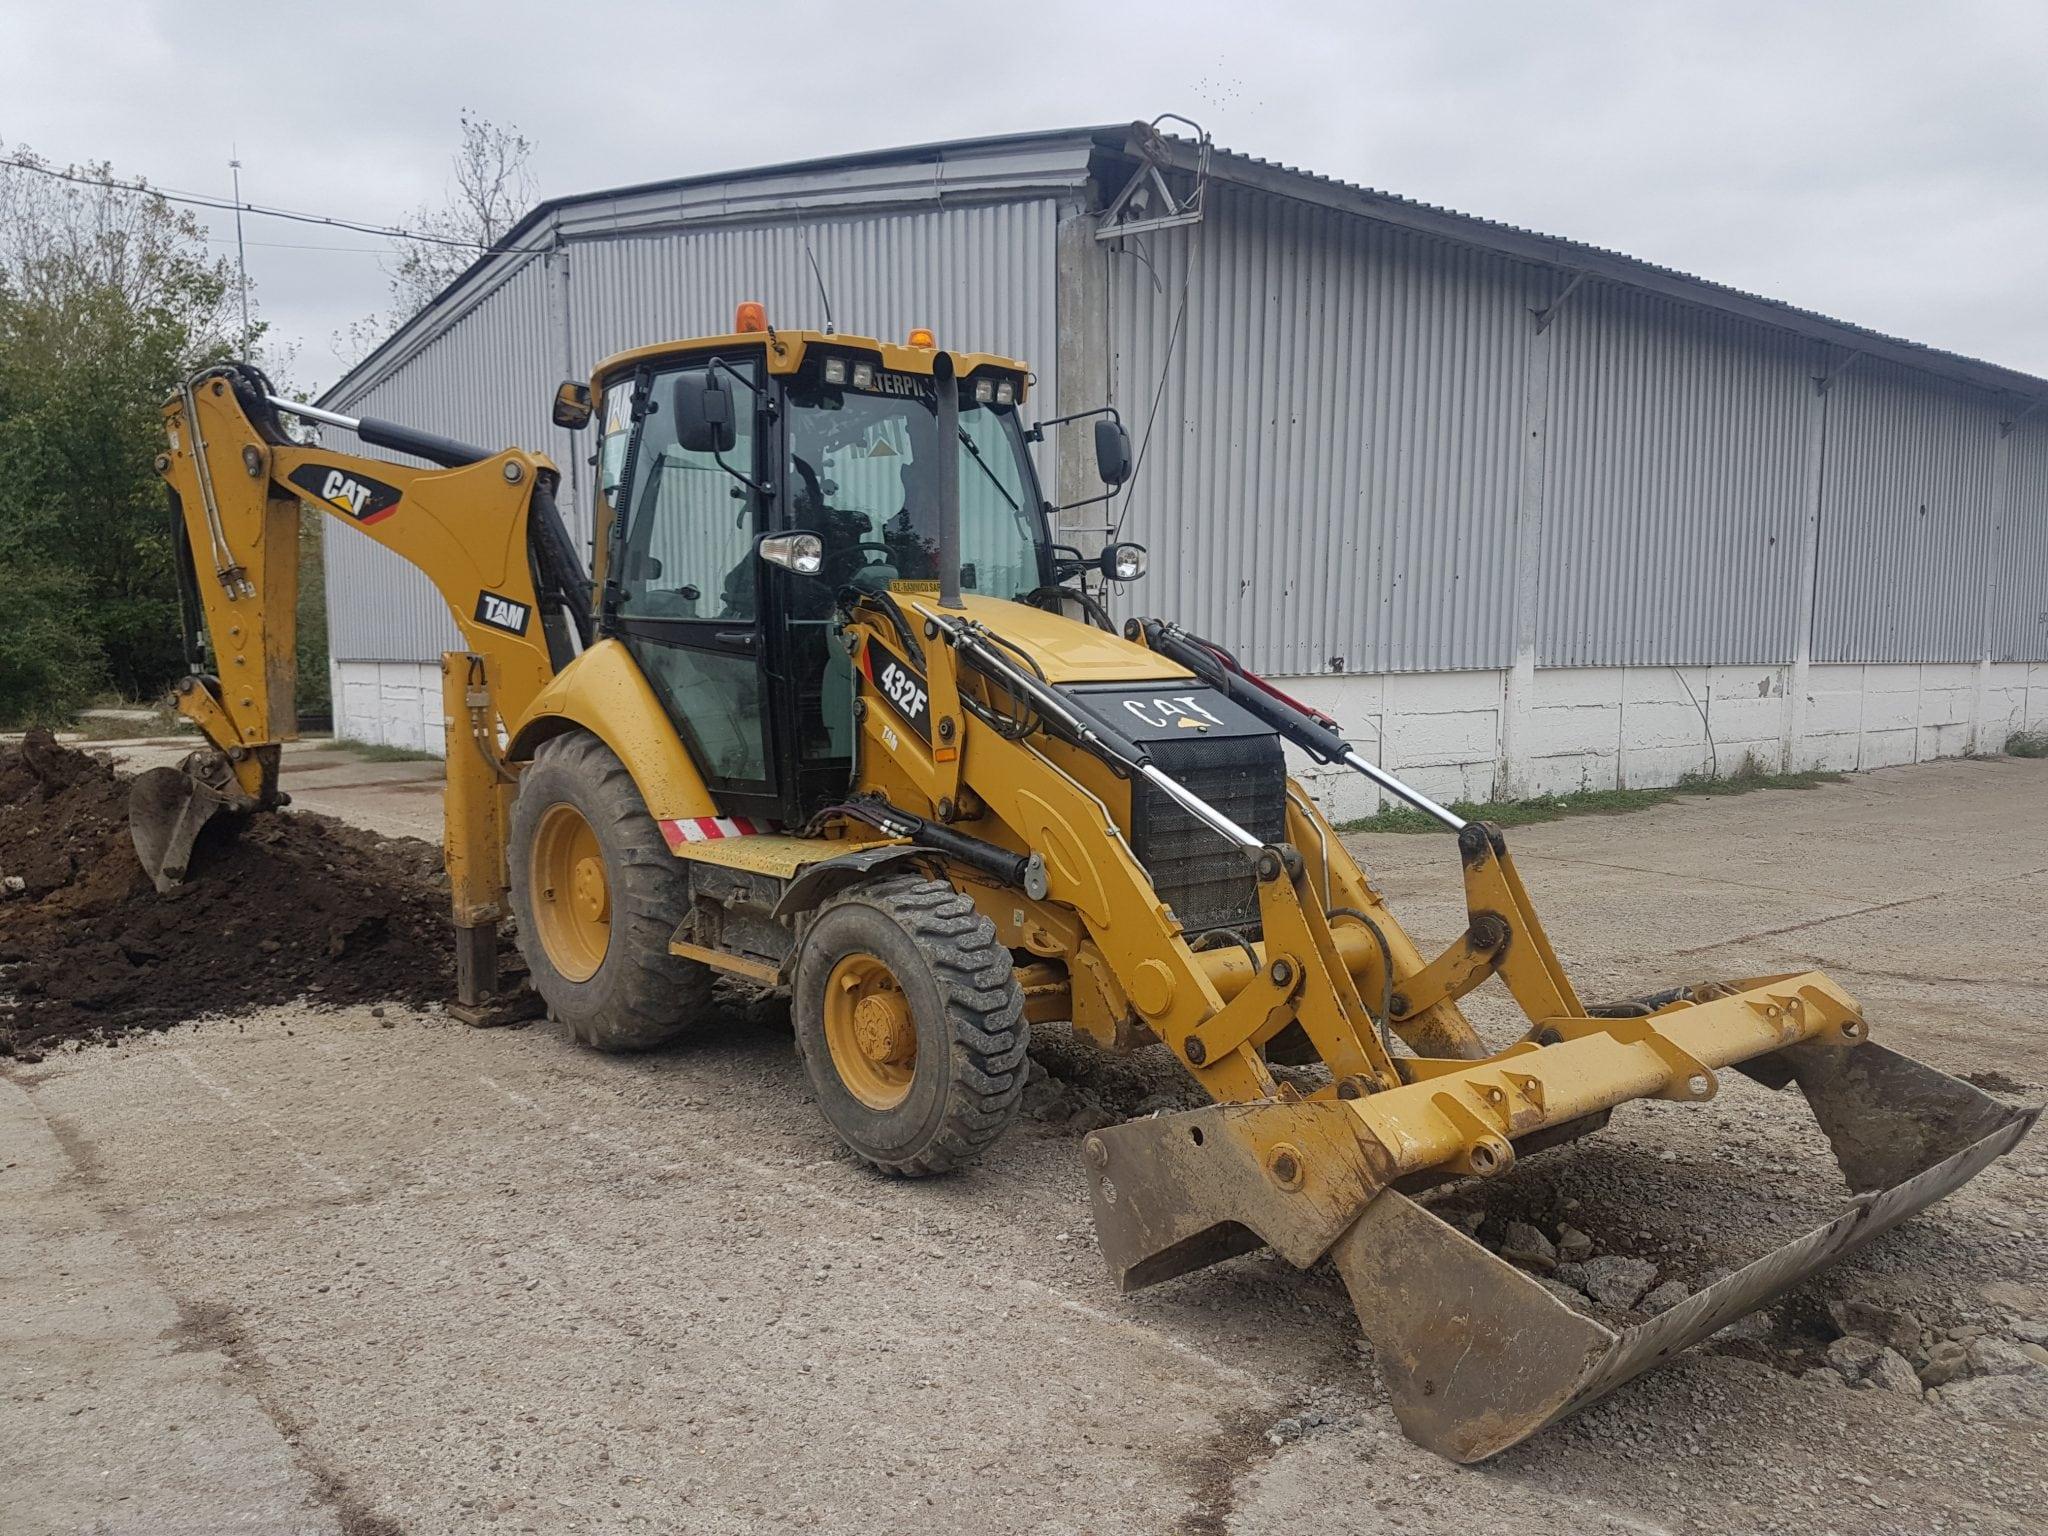 Vand si inchiriez buldoexcavator, buldozer, cilindru compactor, excavatoare mici si mari. Orice utilaj.